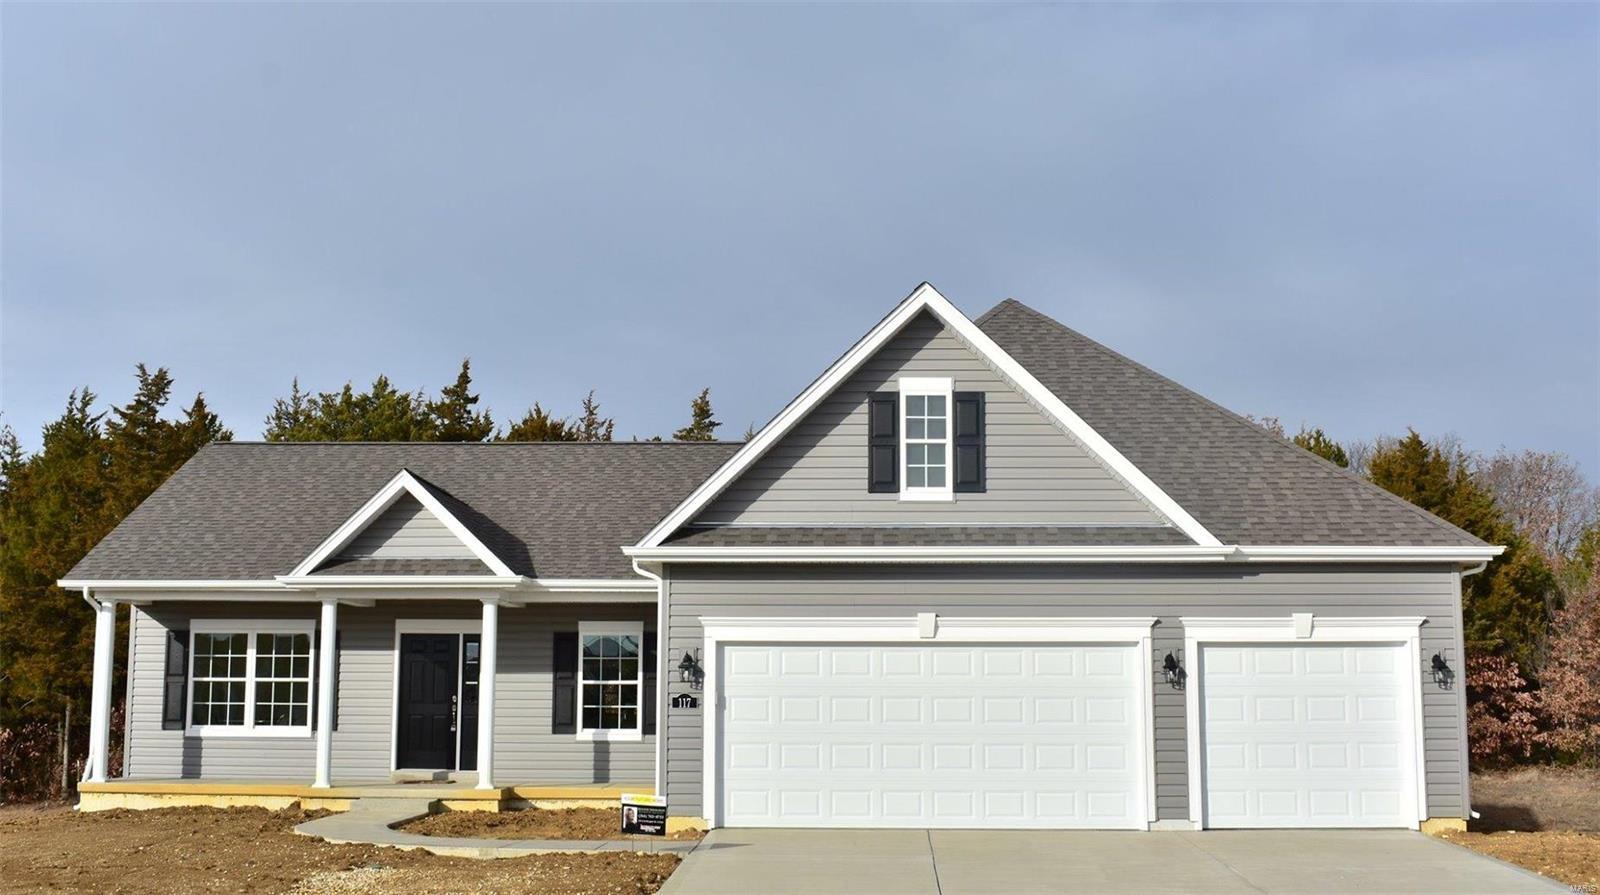 314 TBB-Lot 36 Carolyn Circle Property Photo - Wright City, MO real estate listing